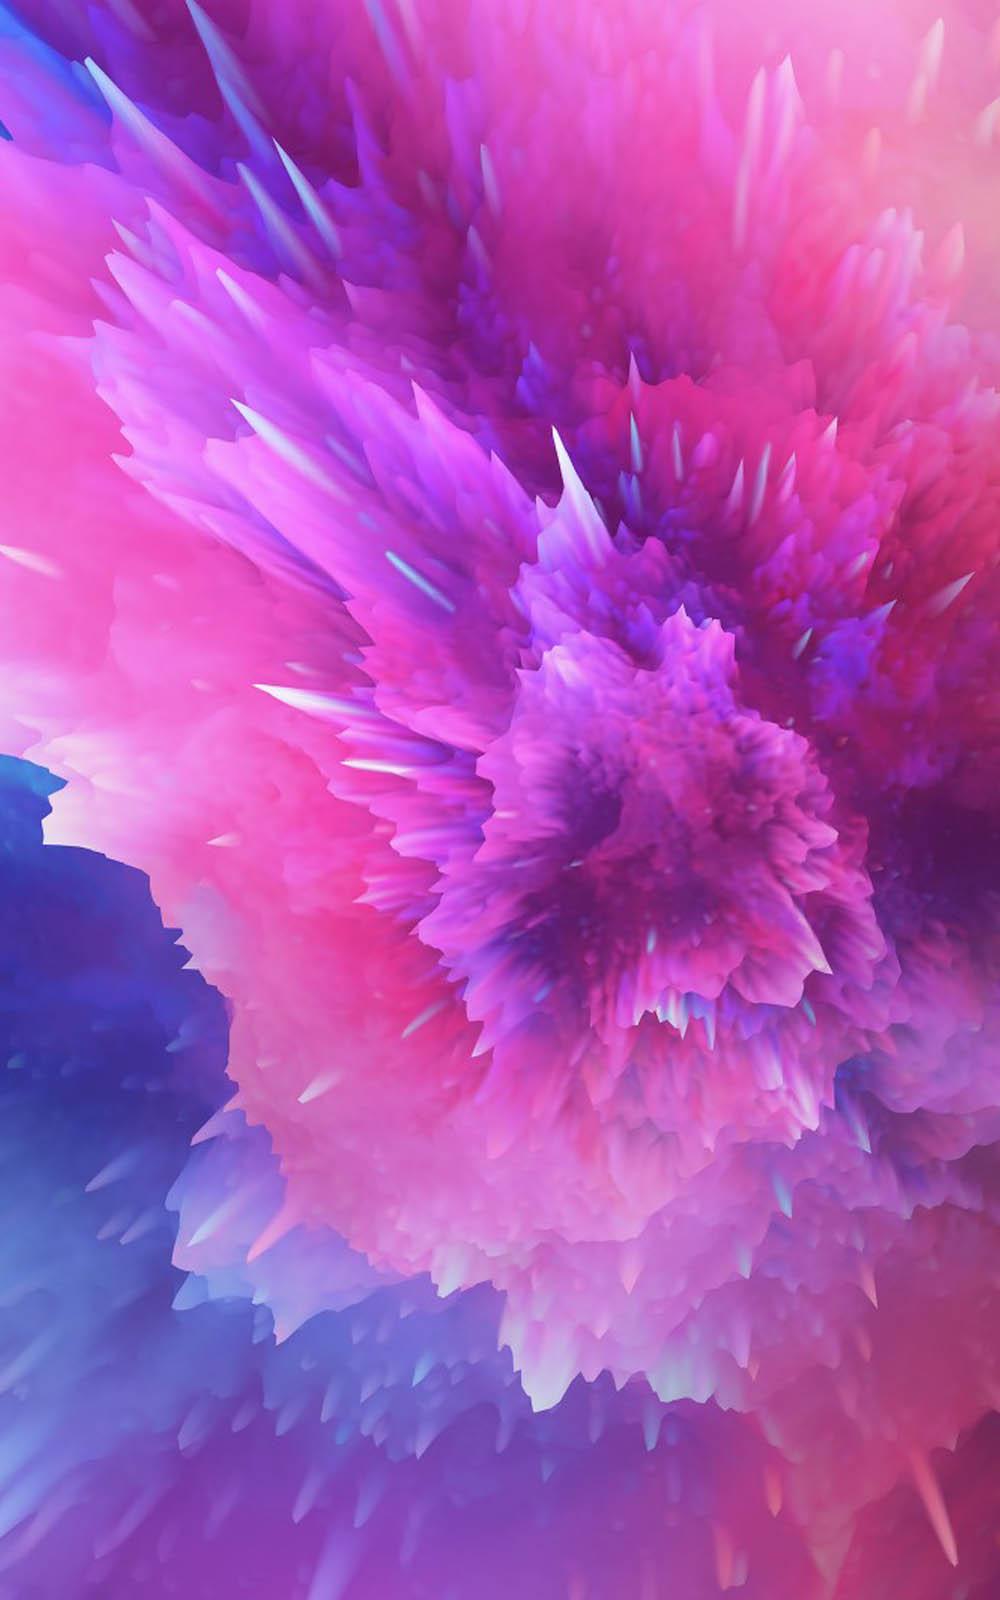 Download Color Splash Art Free Pure 4k Ultra Hd Mobile Wallpaper